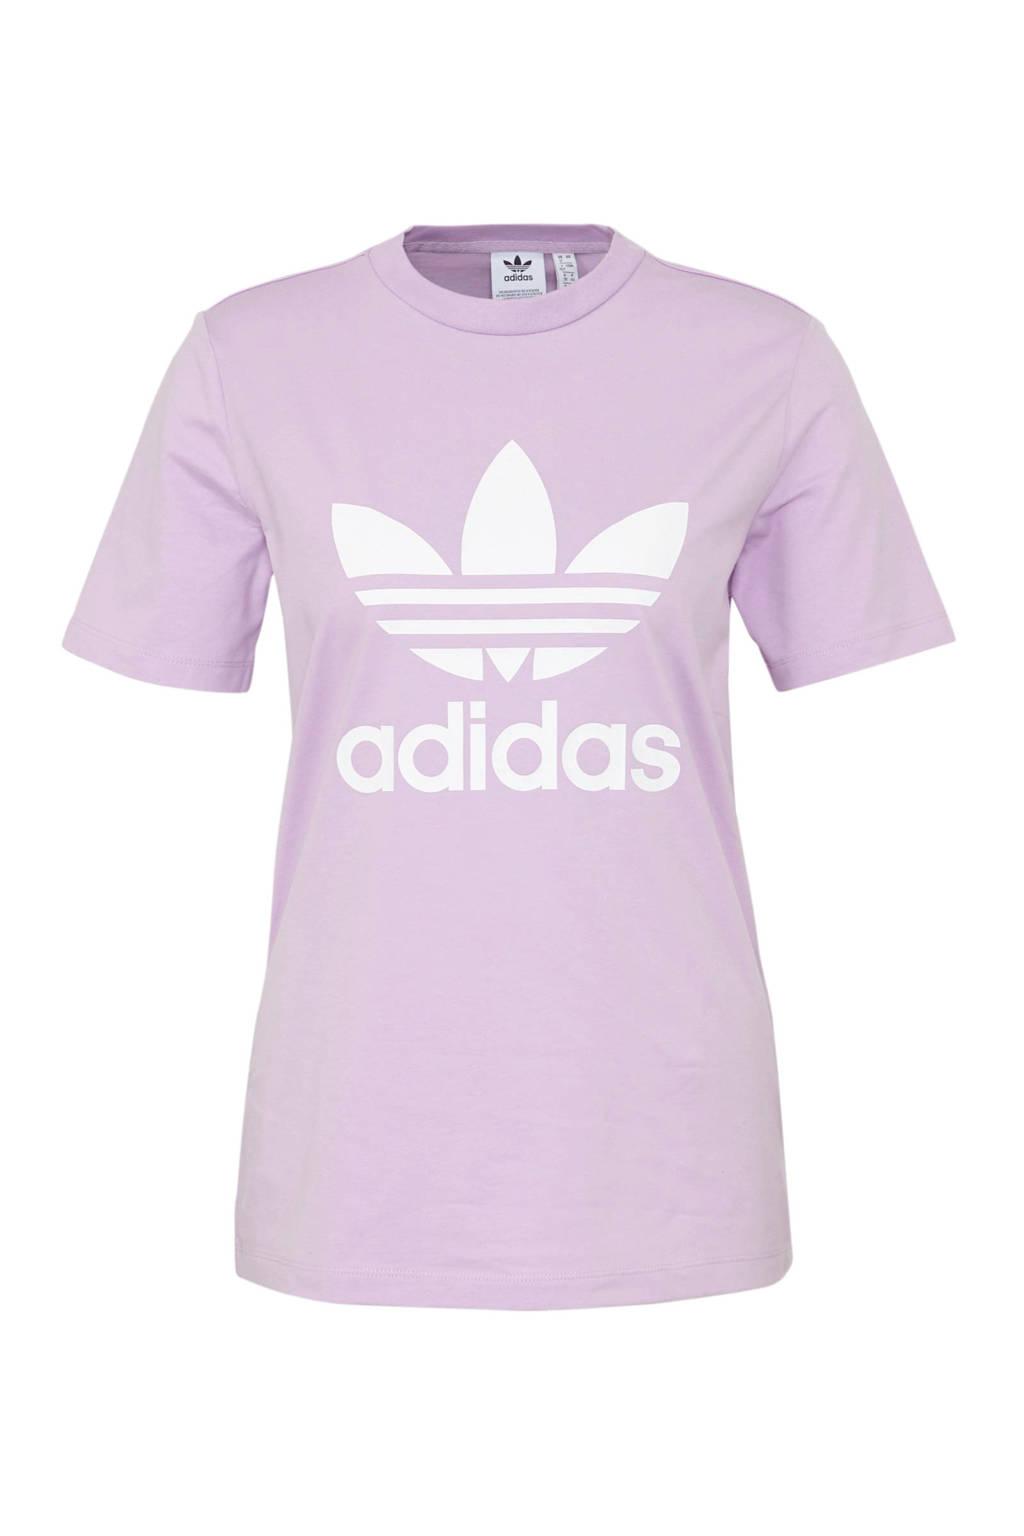 adidas originals T-shirt paars, Paars/wit, Dames